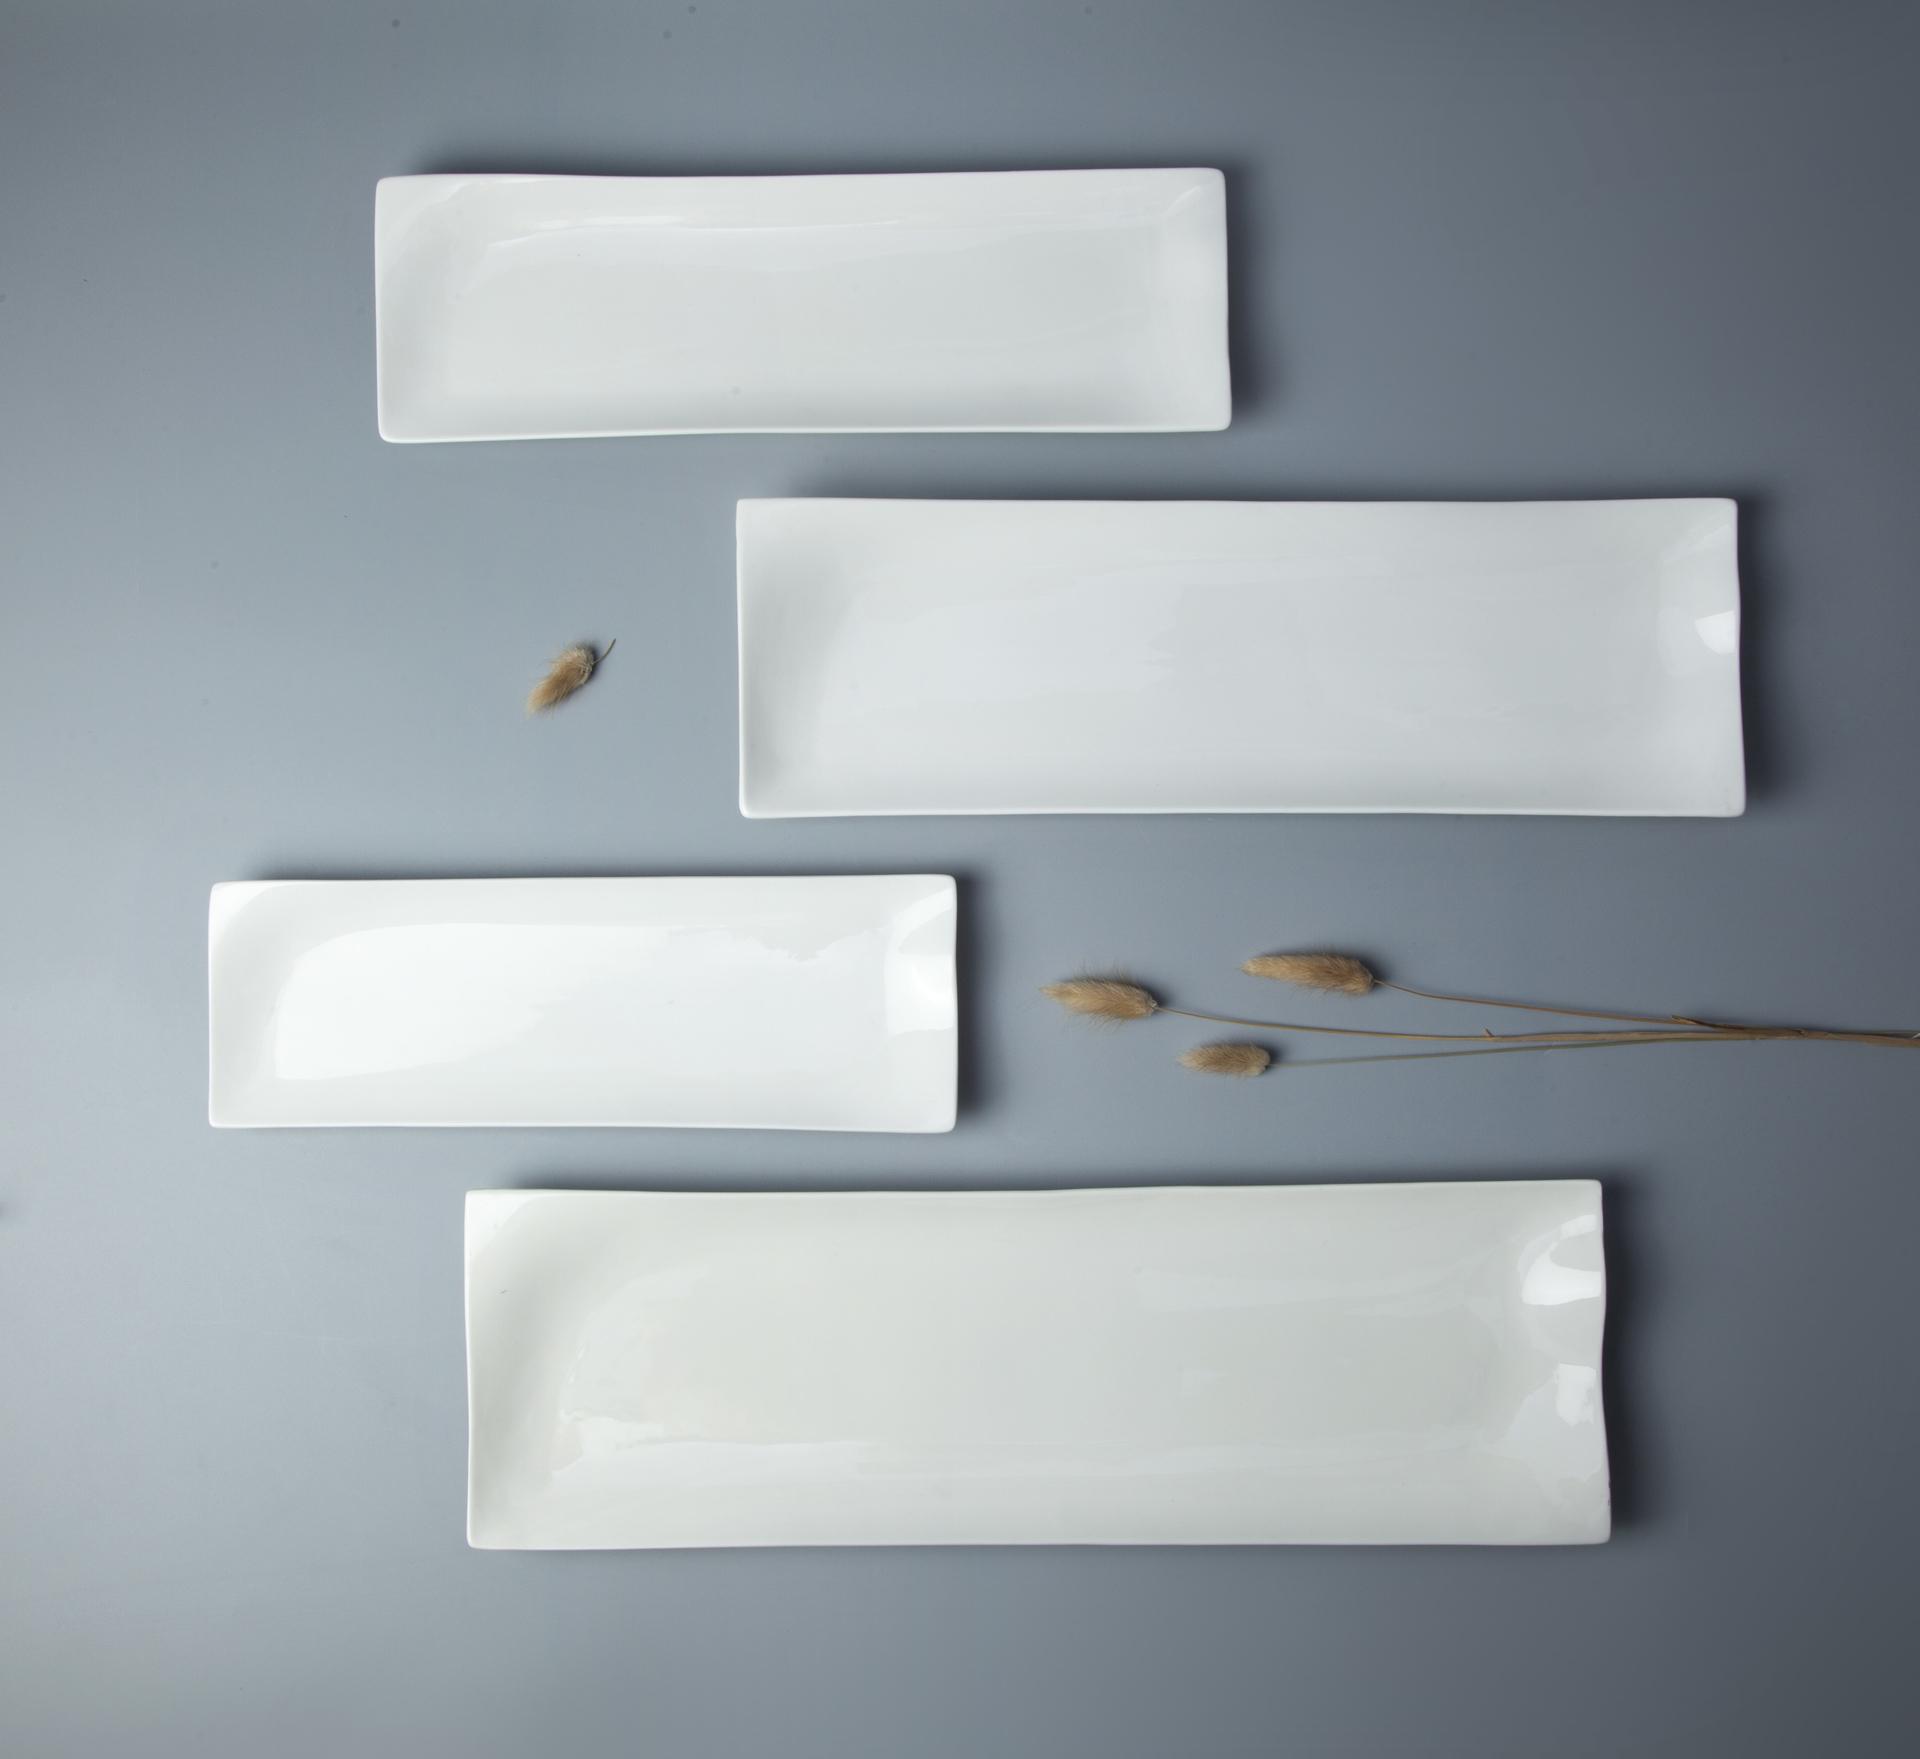 Exquisite popular design rectangle ceramic porcelain plate for hotel & restaurant